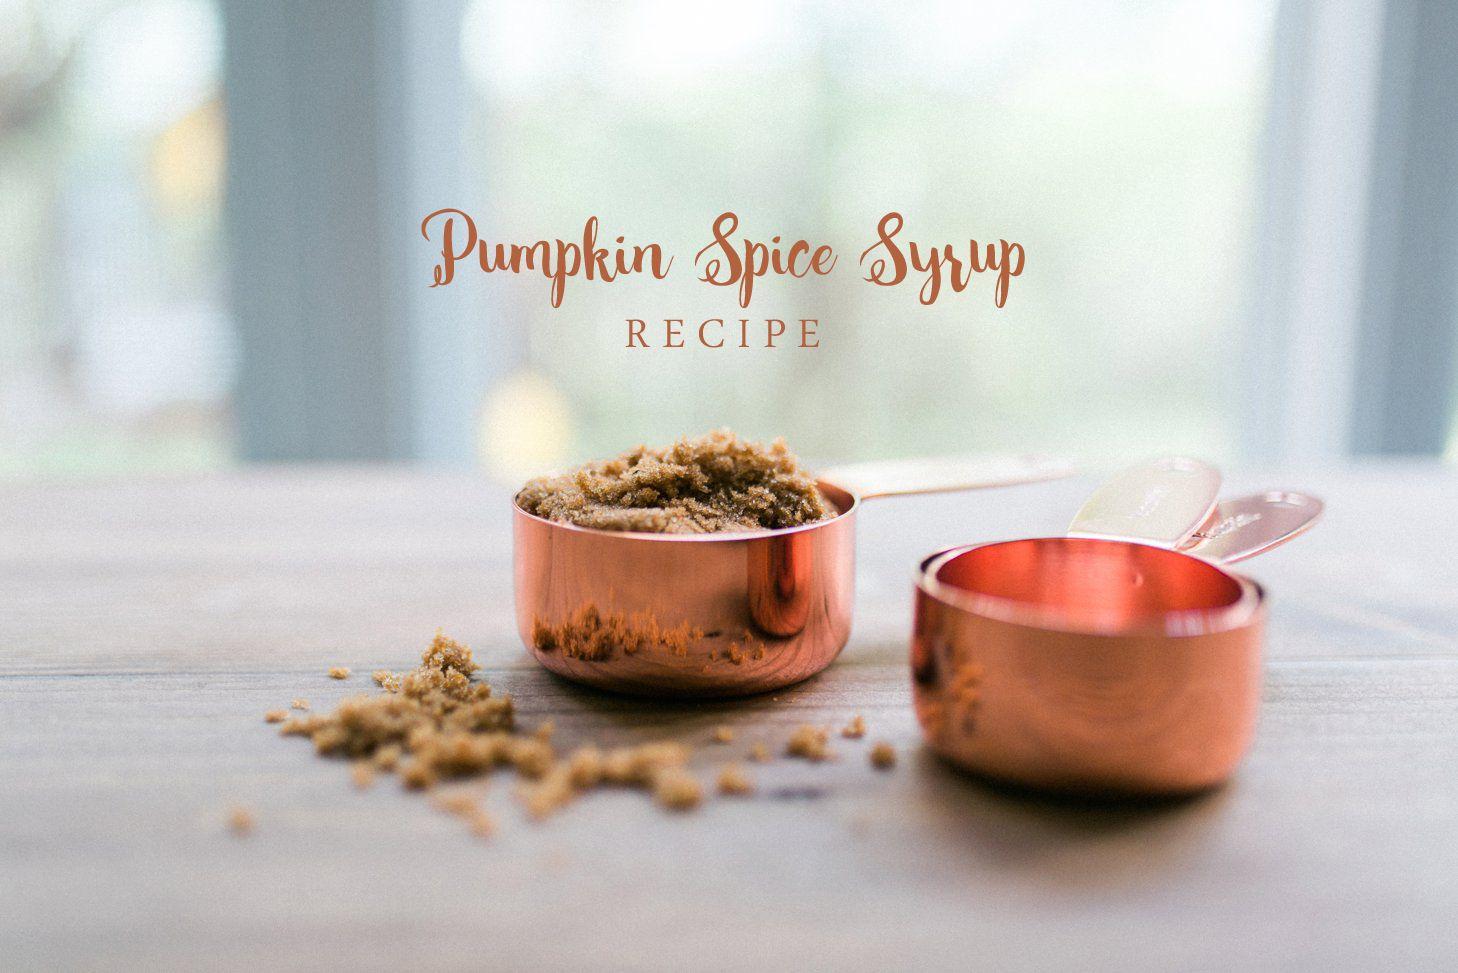 Pumpkin spice syrup recipe